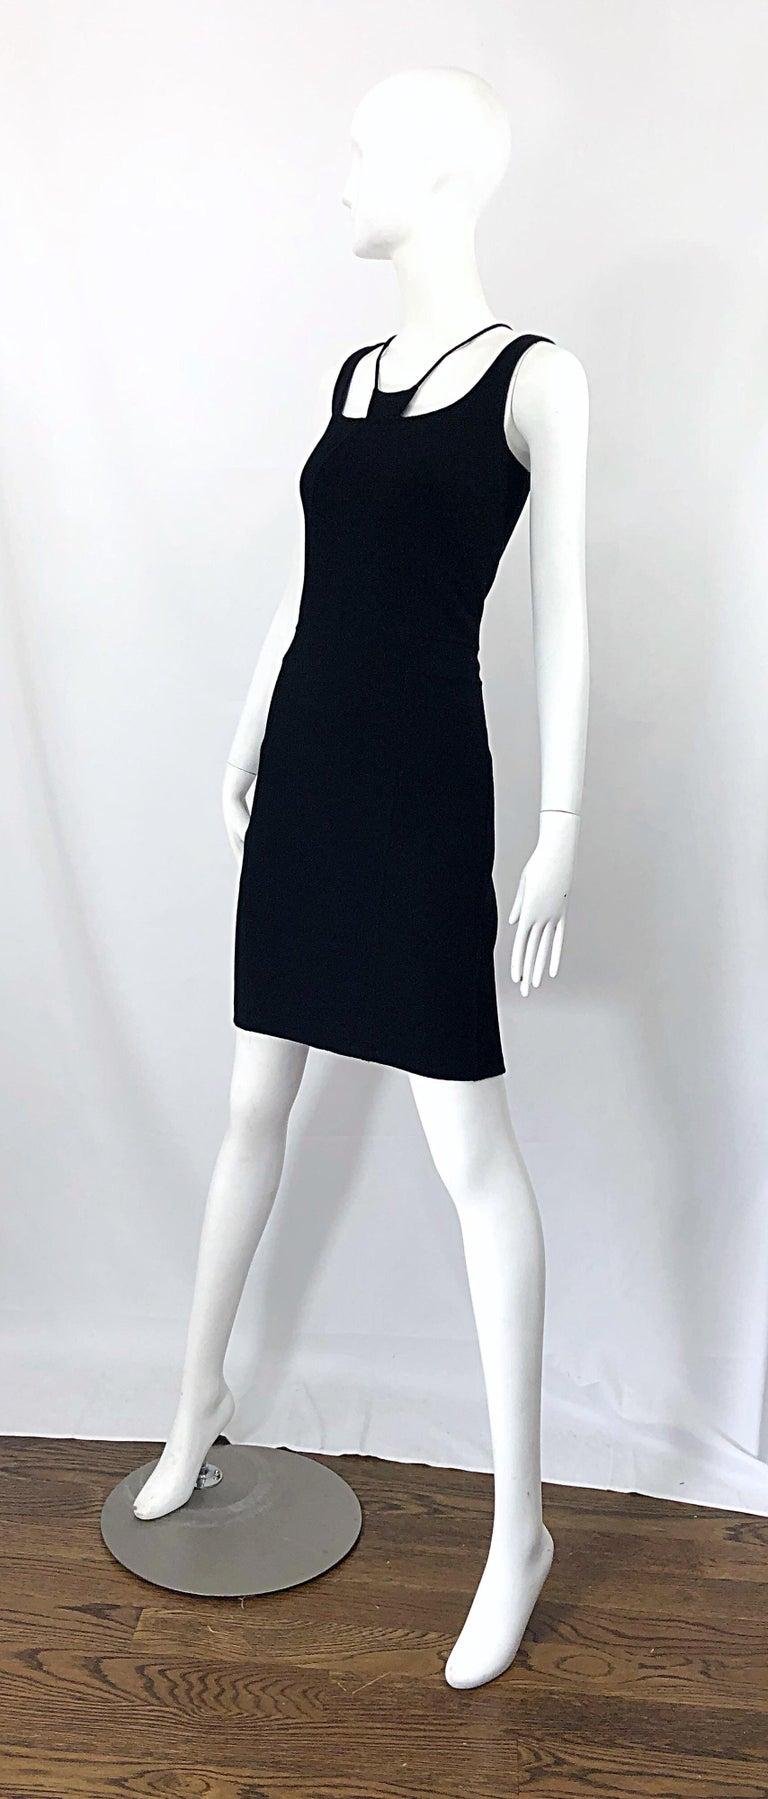 1990s Chado Ralph Rucci Rare Black Wool ' Bondage ' Vintage 90s Dress Size 4  For Sale 3